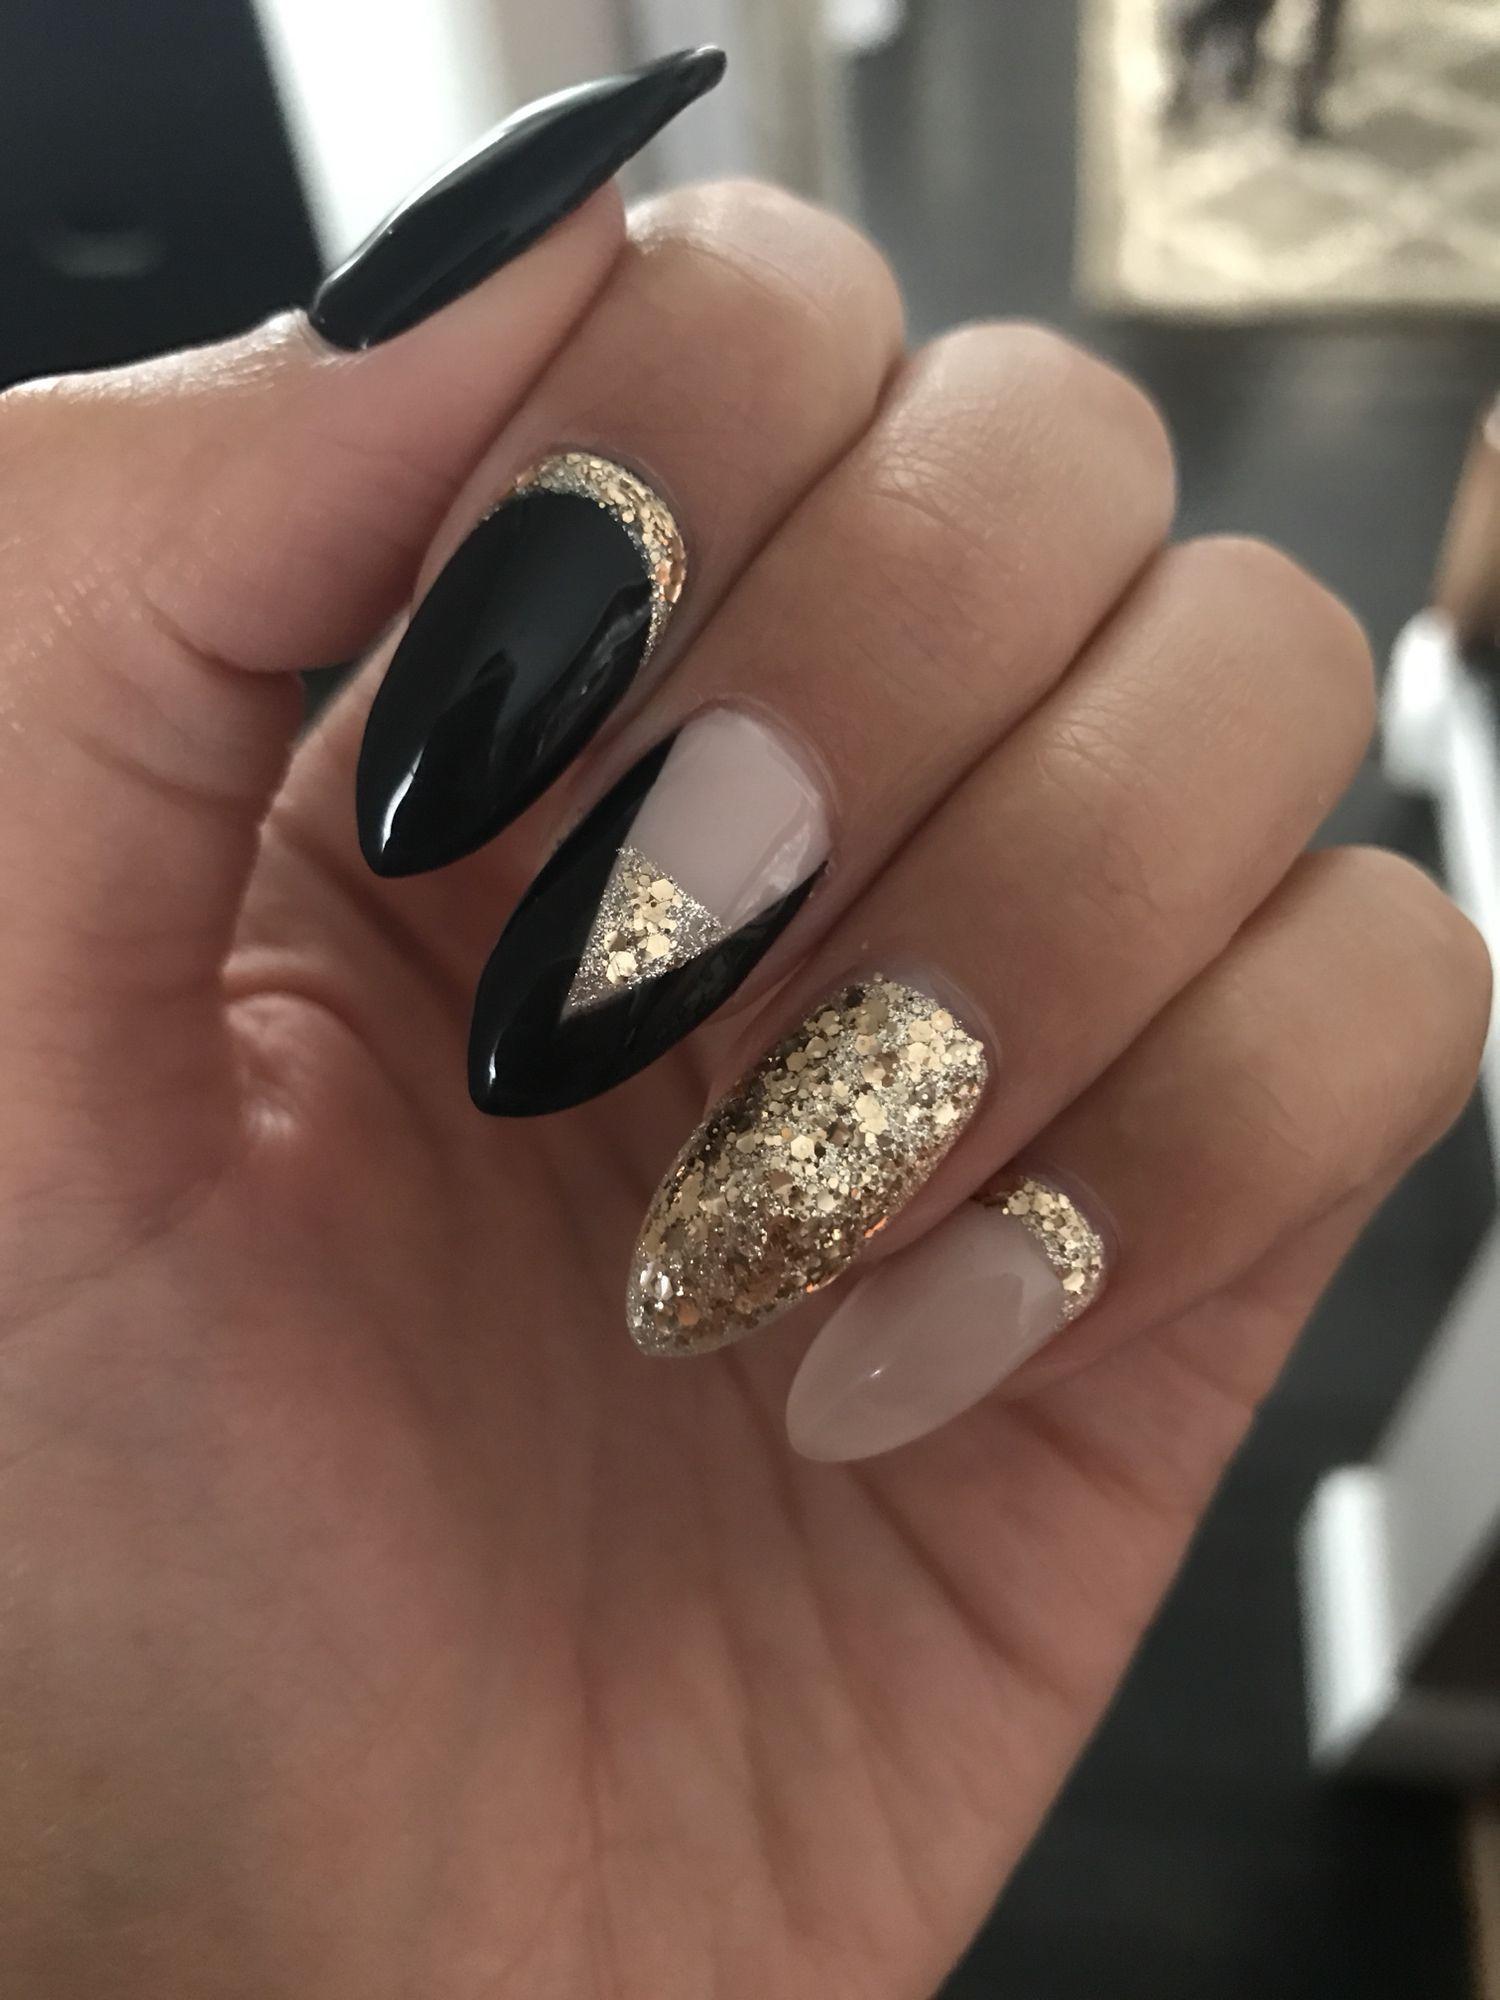 New Years Nails Acrylic | Thin nails